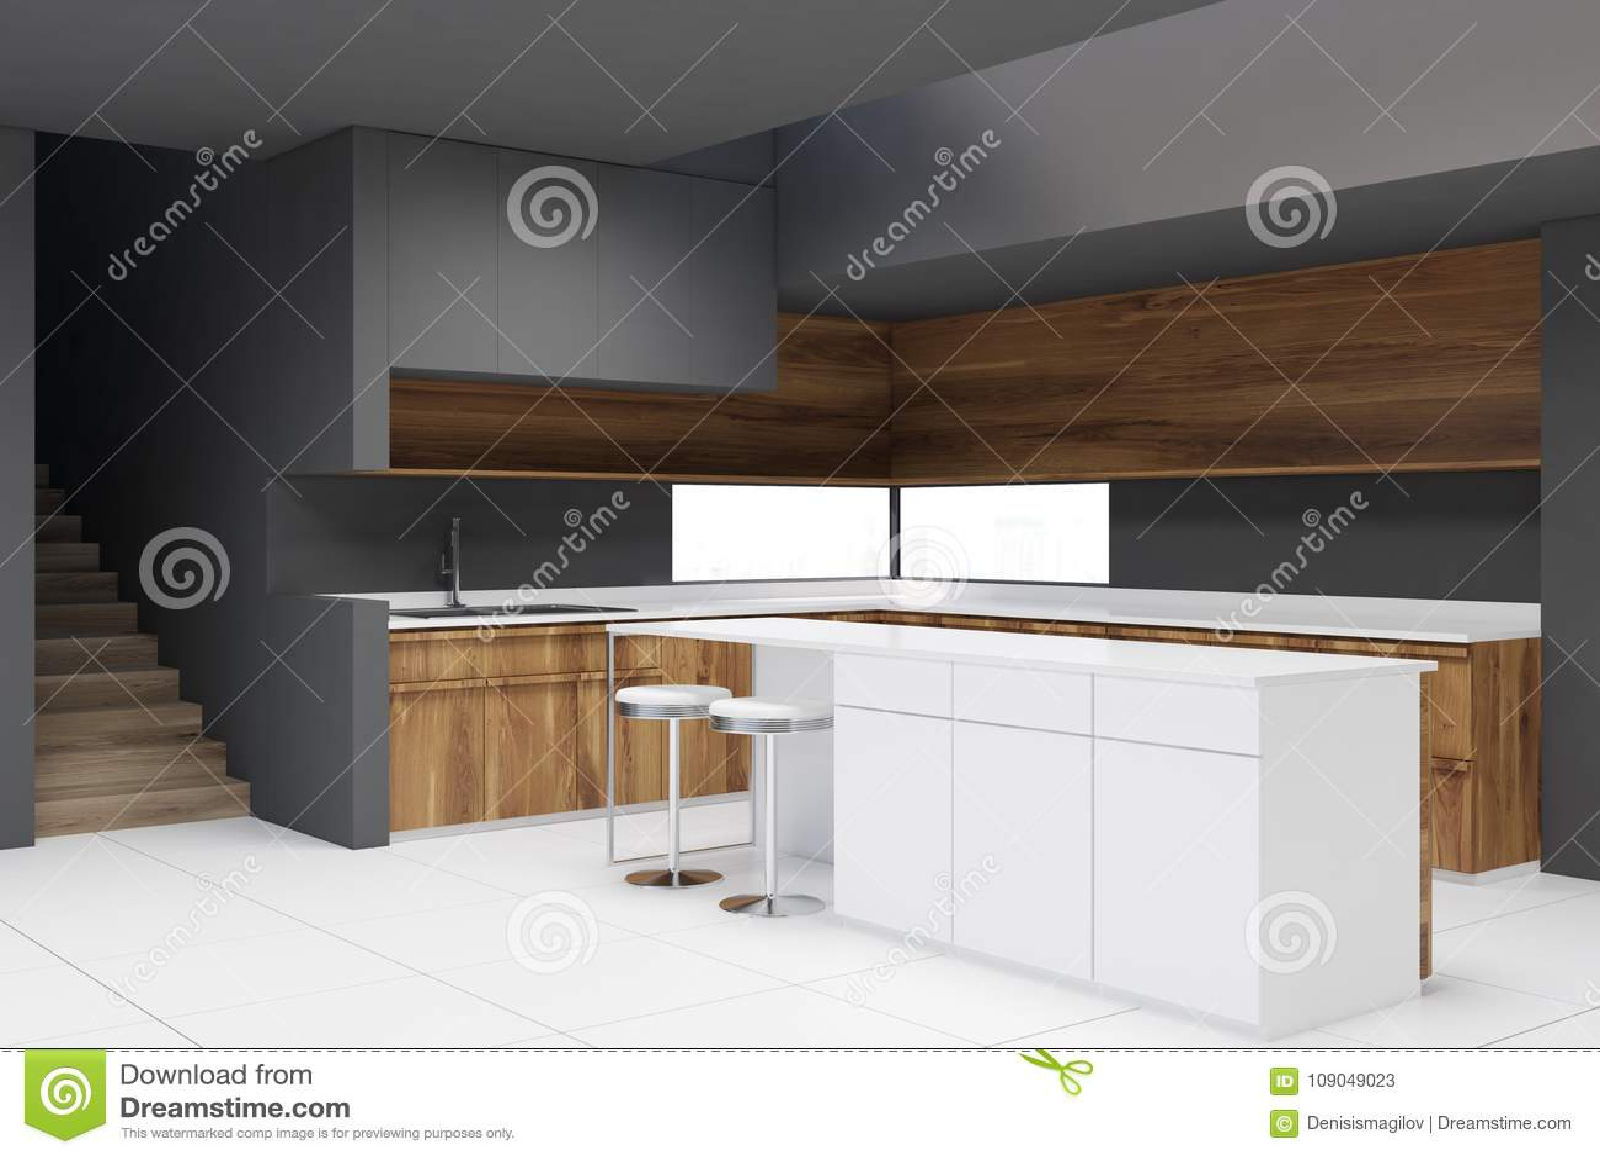 Keuken Houten Bar : Grijze keuken houten countertops bar stock illustratie